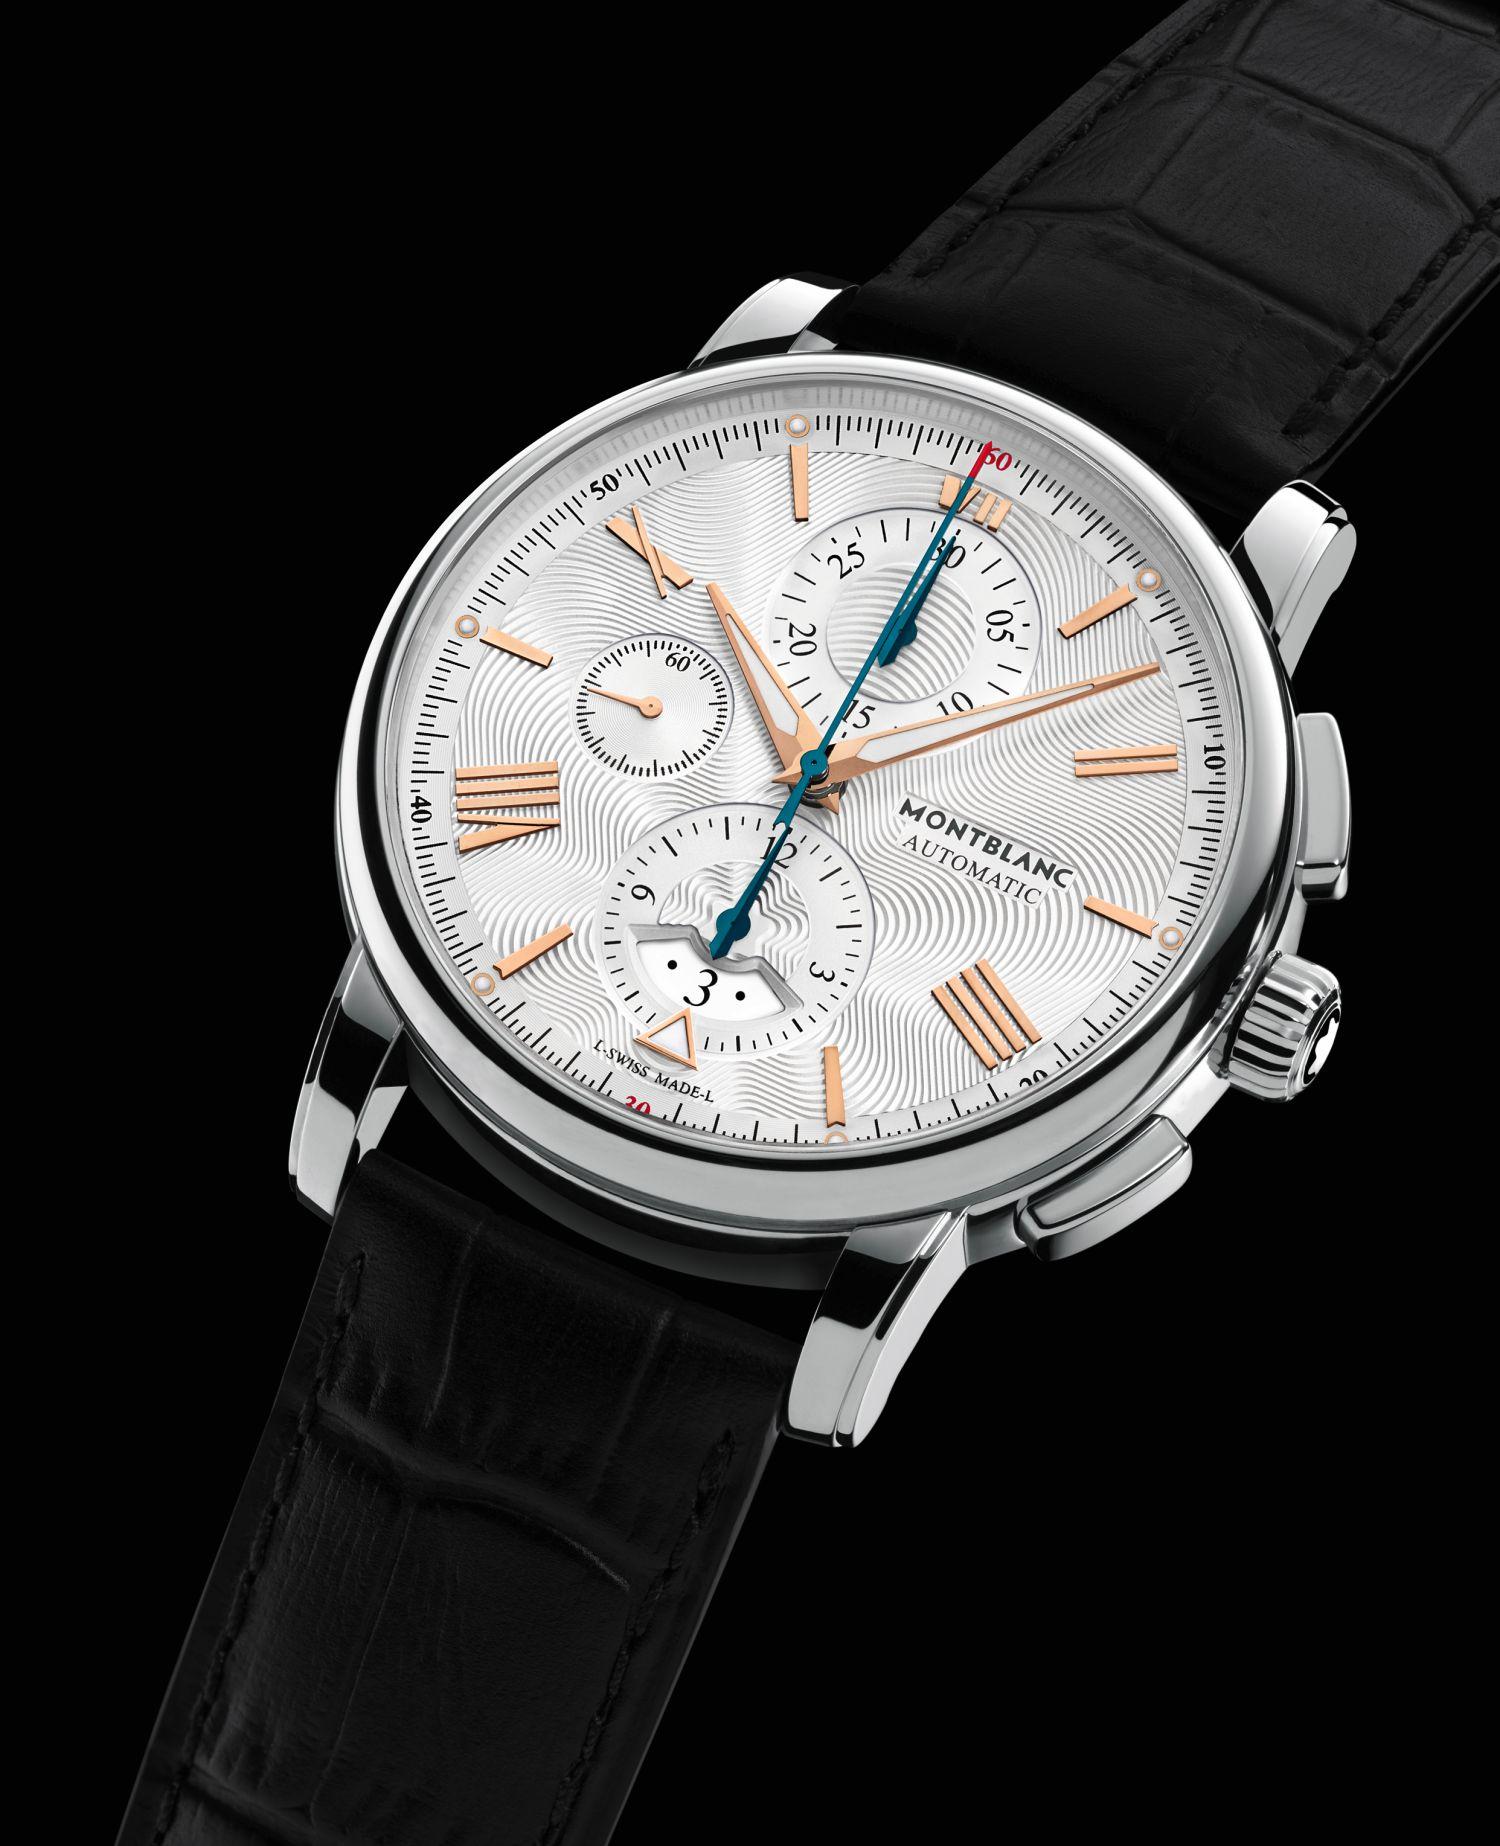 Montblanc-4810-Chronograph-Automatic-1.jpg